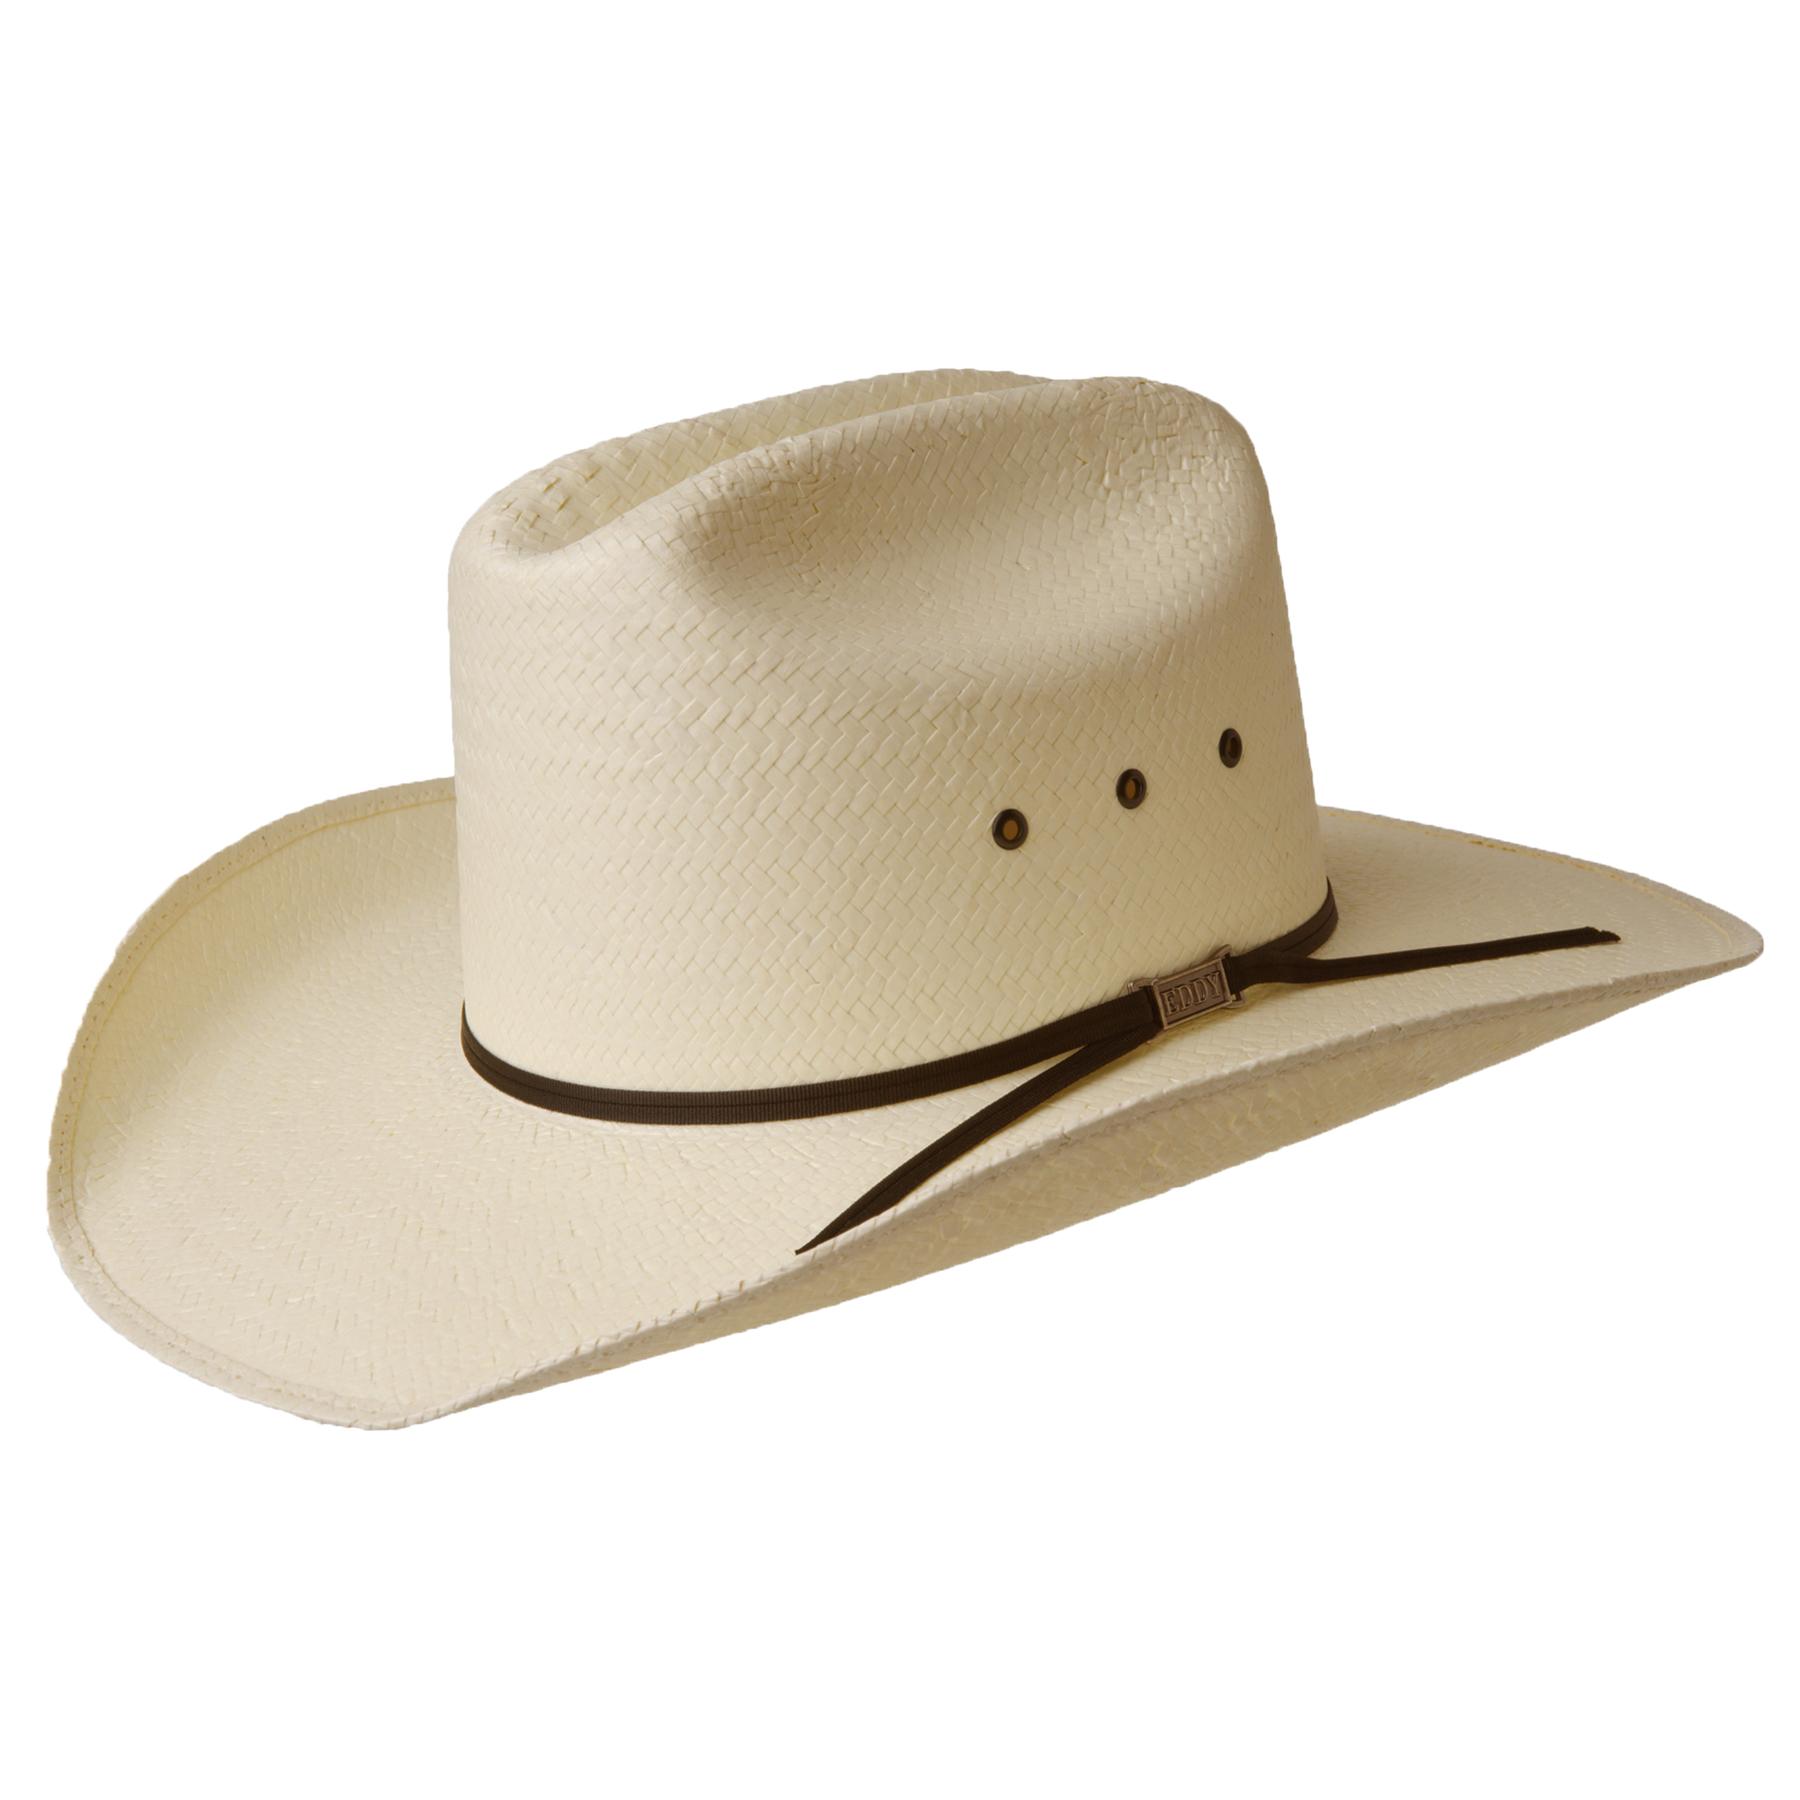 Eddy Bros. Alamo Jr. Hat in Ivory